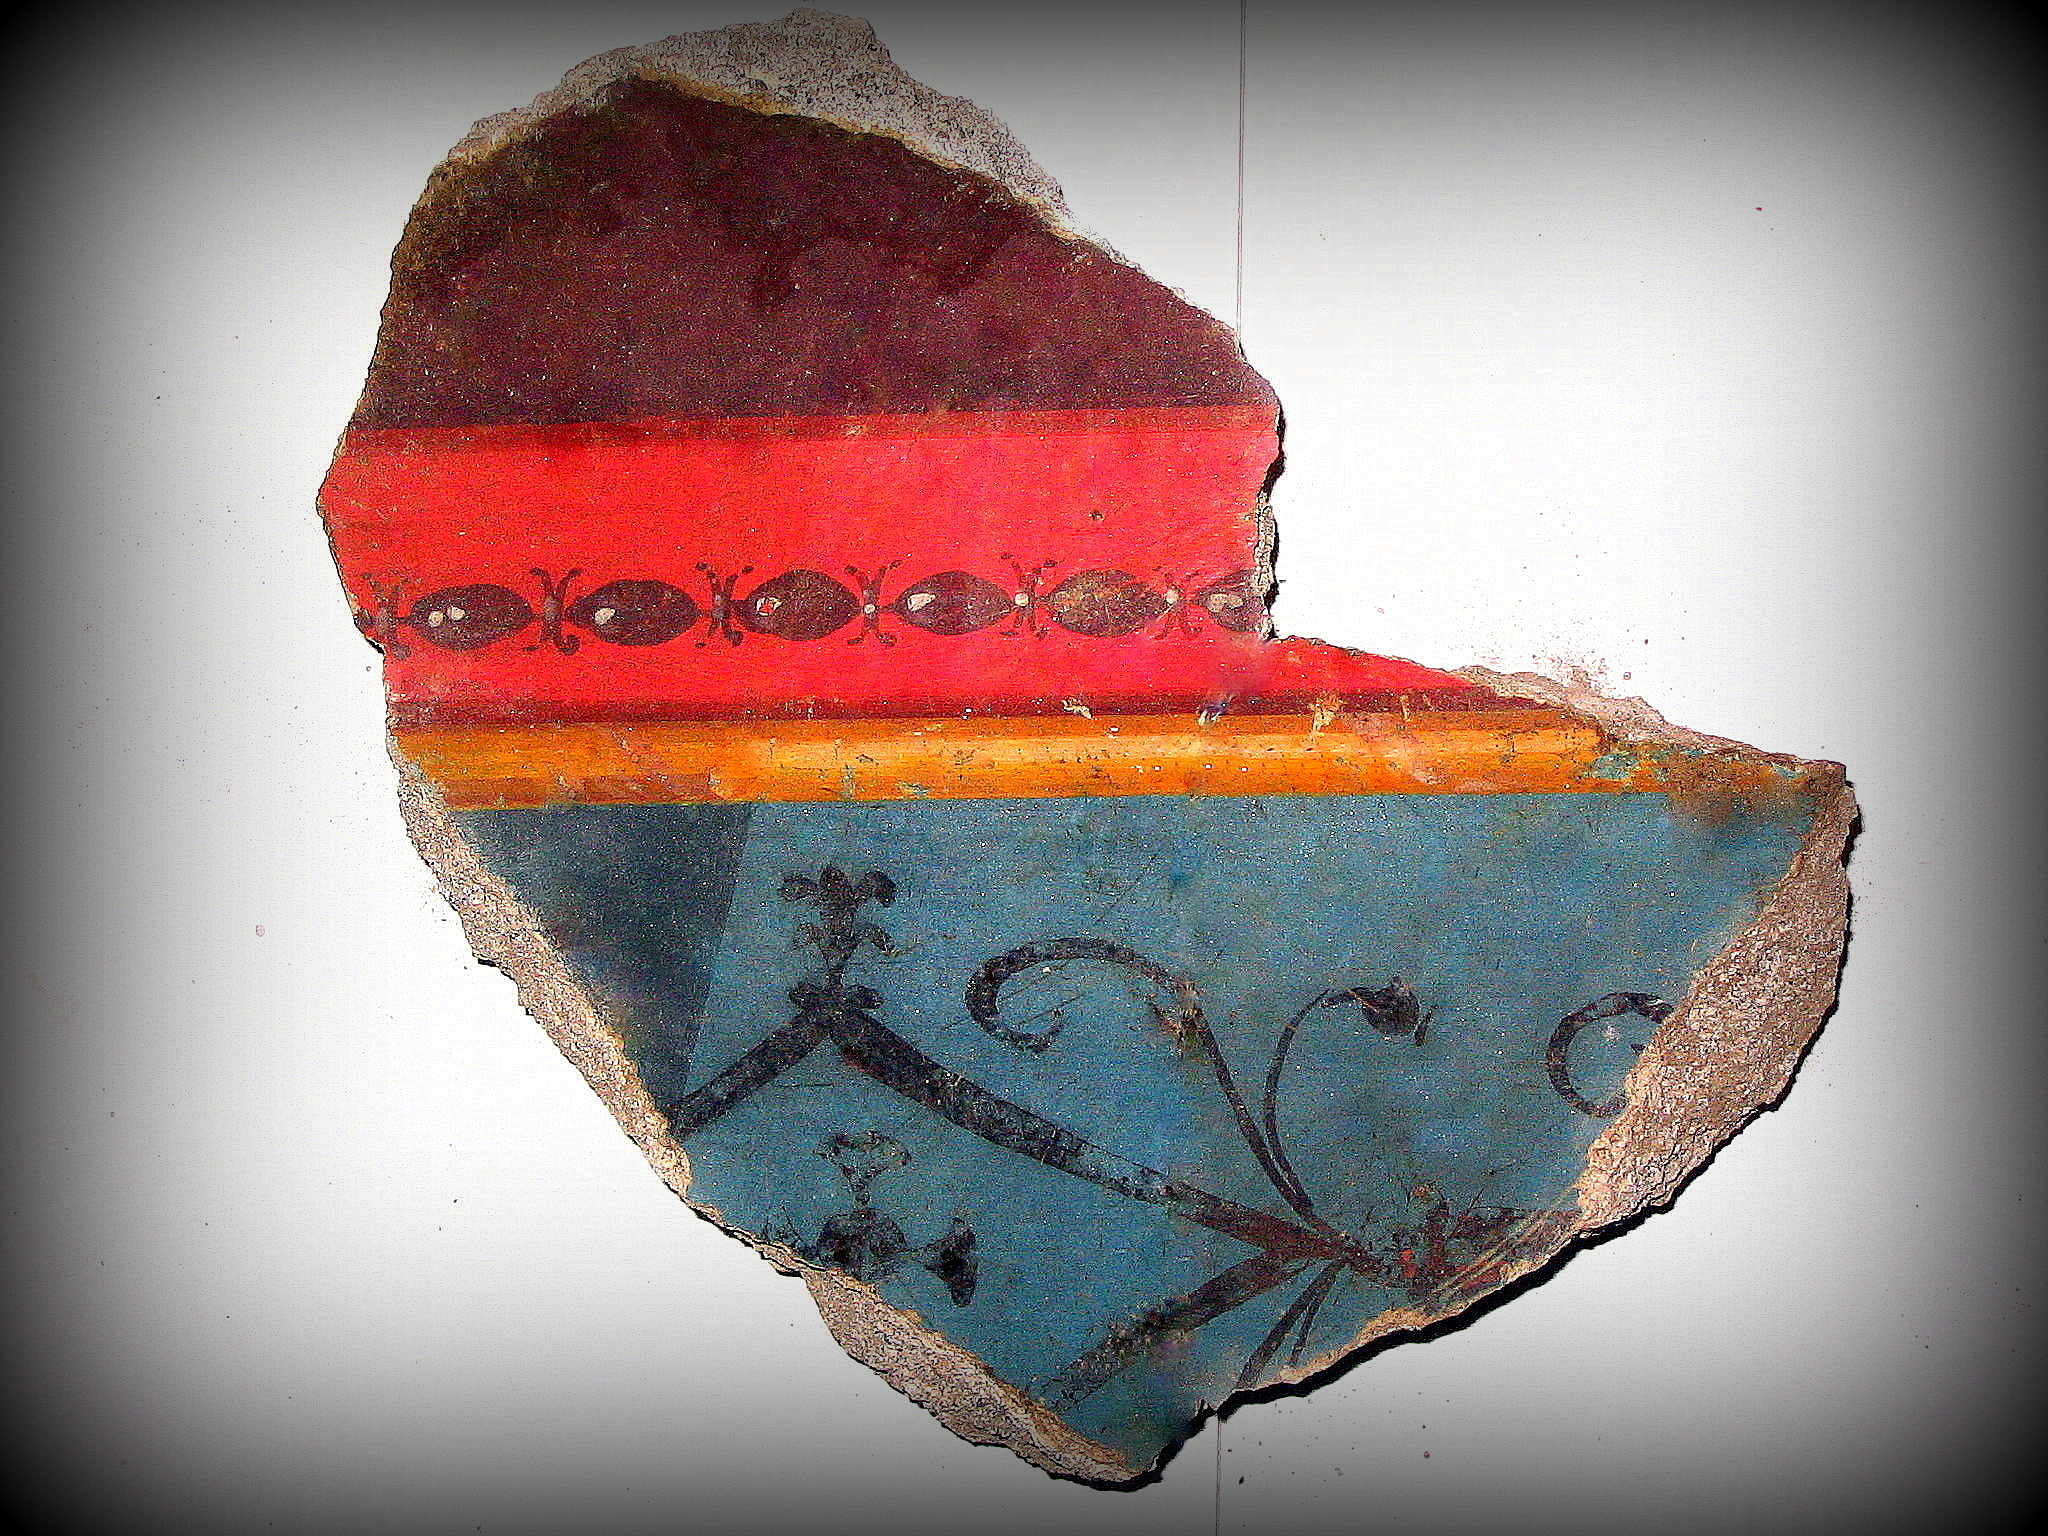 restauro manufatti archeologici